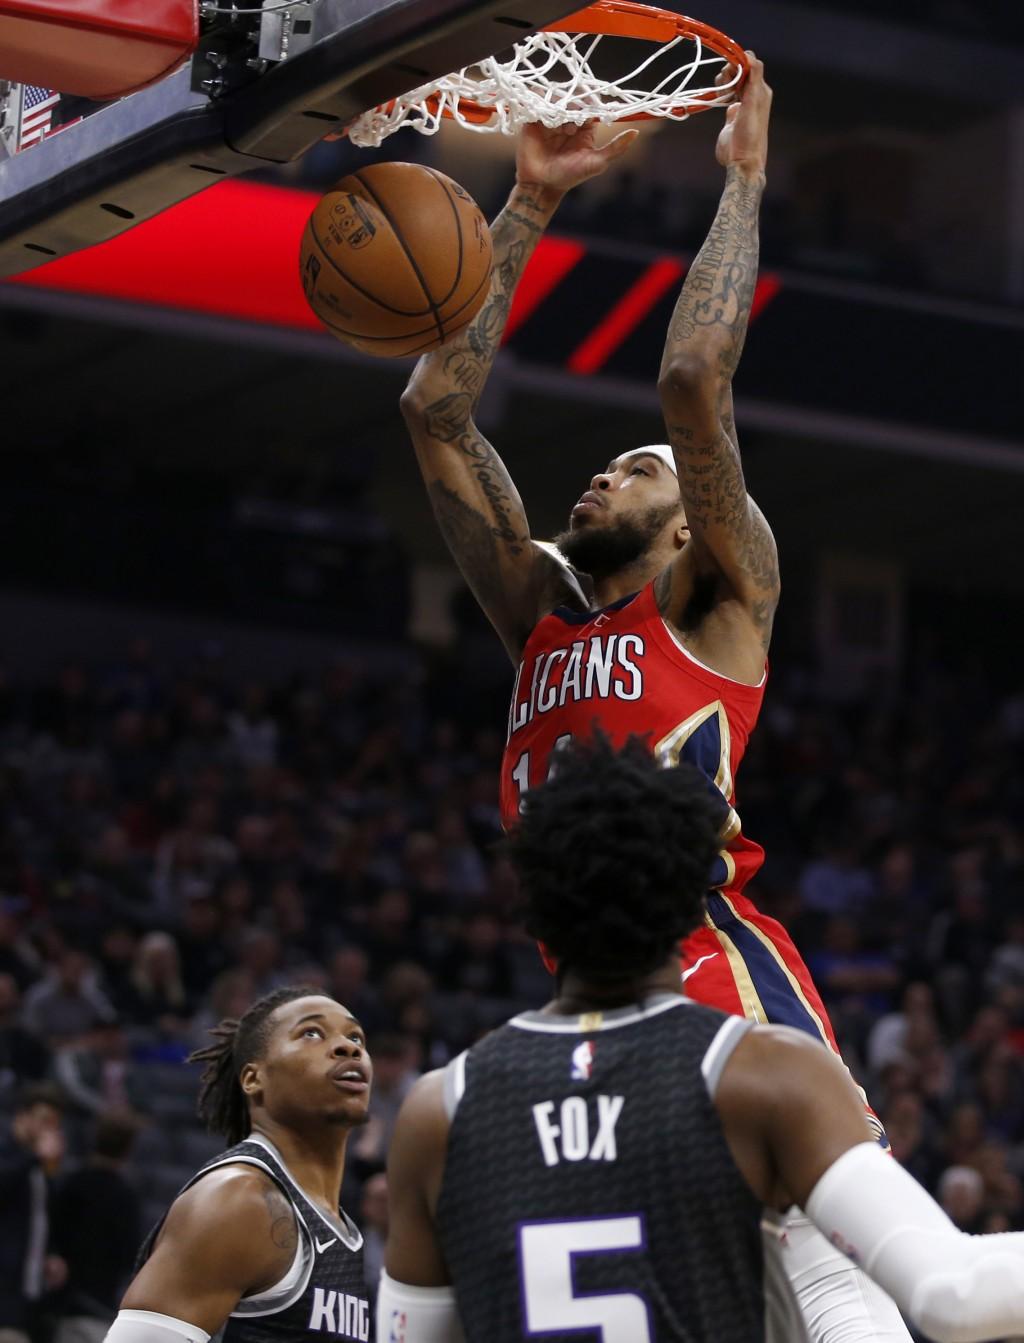 New Orleans Pelicans forward Brandon Ingram, center, dunks between Sacramento Kings' Richaun Holmes, left, and De'Aaron Fox during the first quarter o...